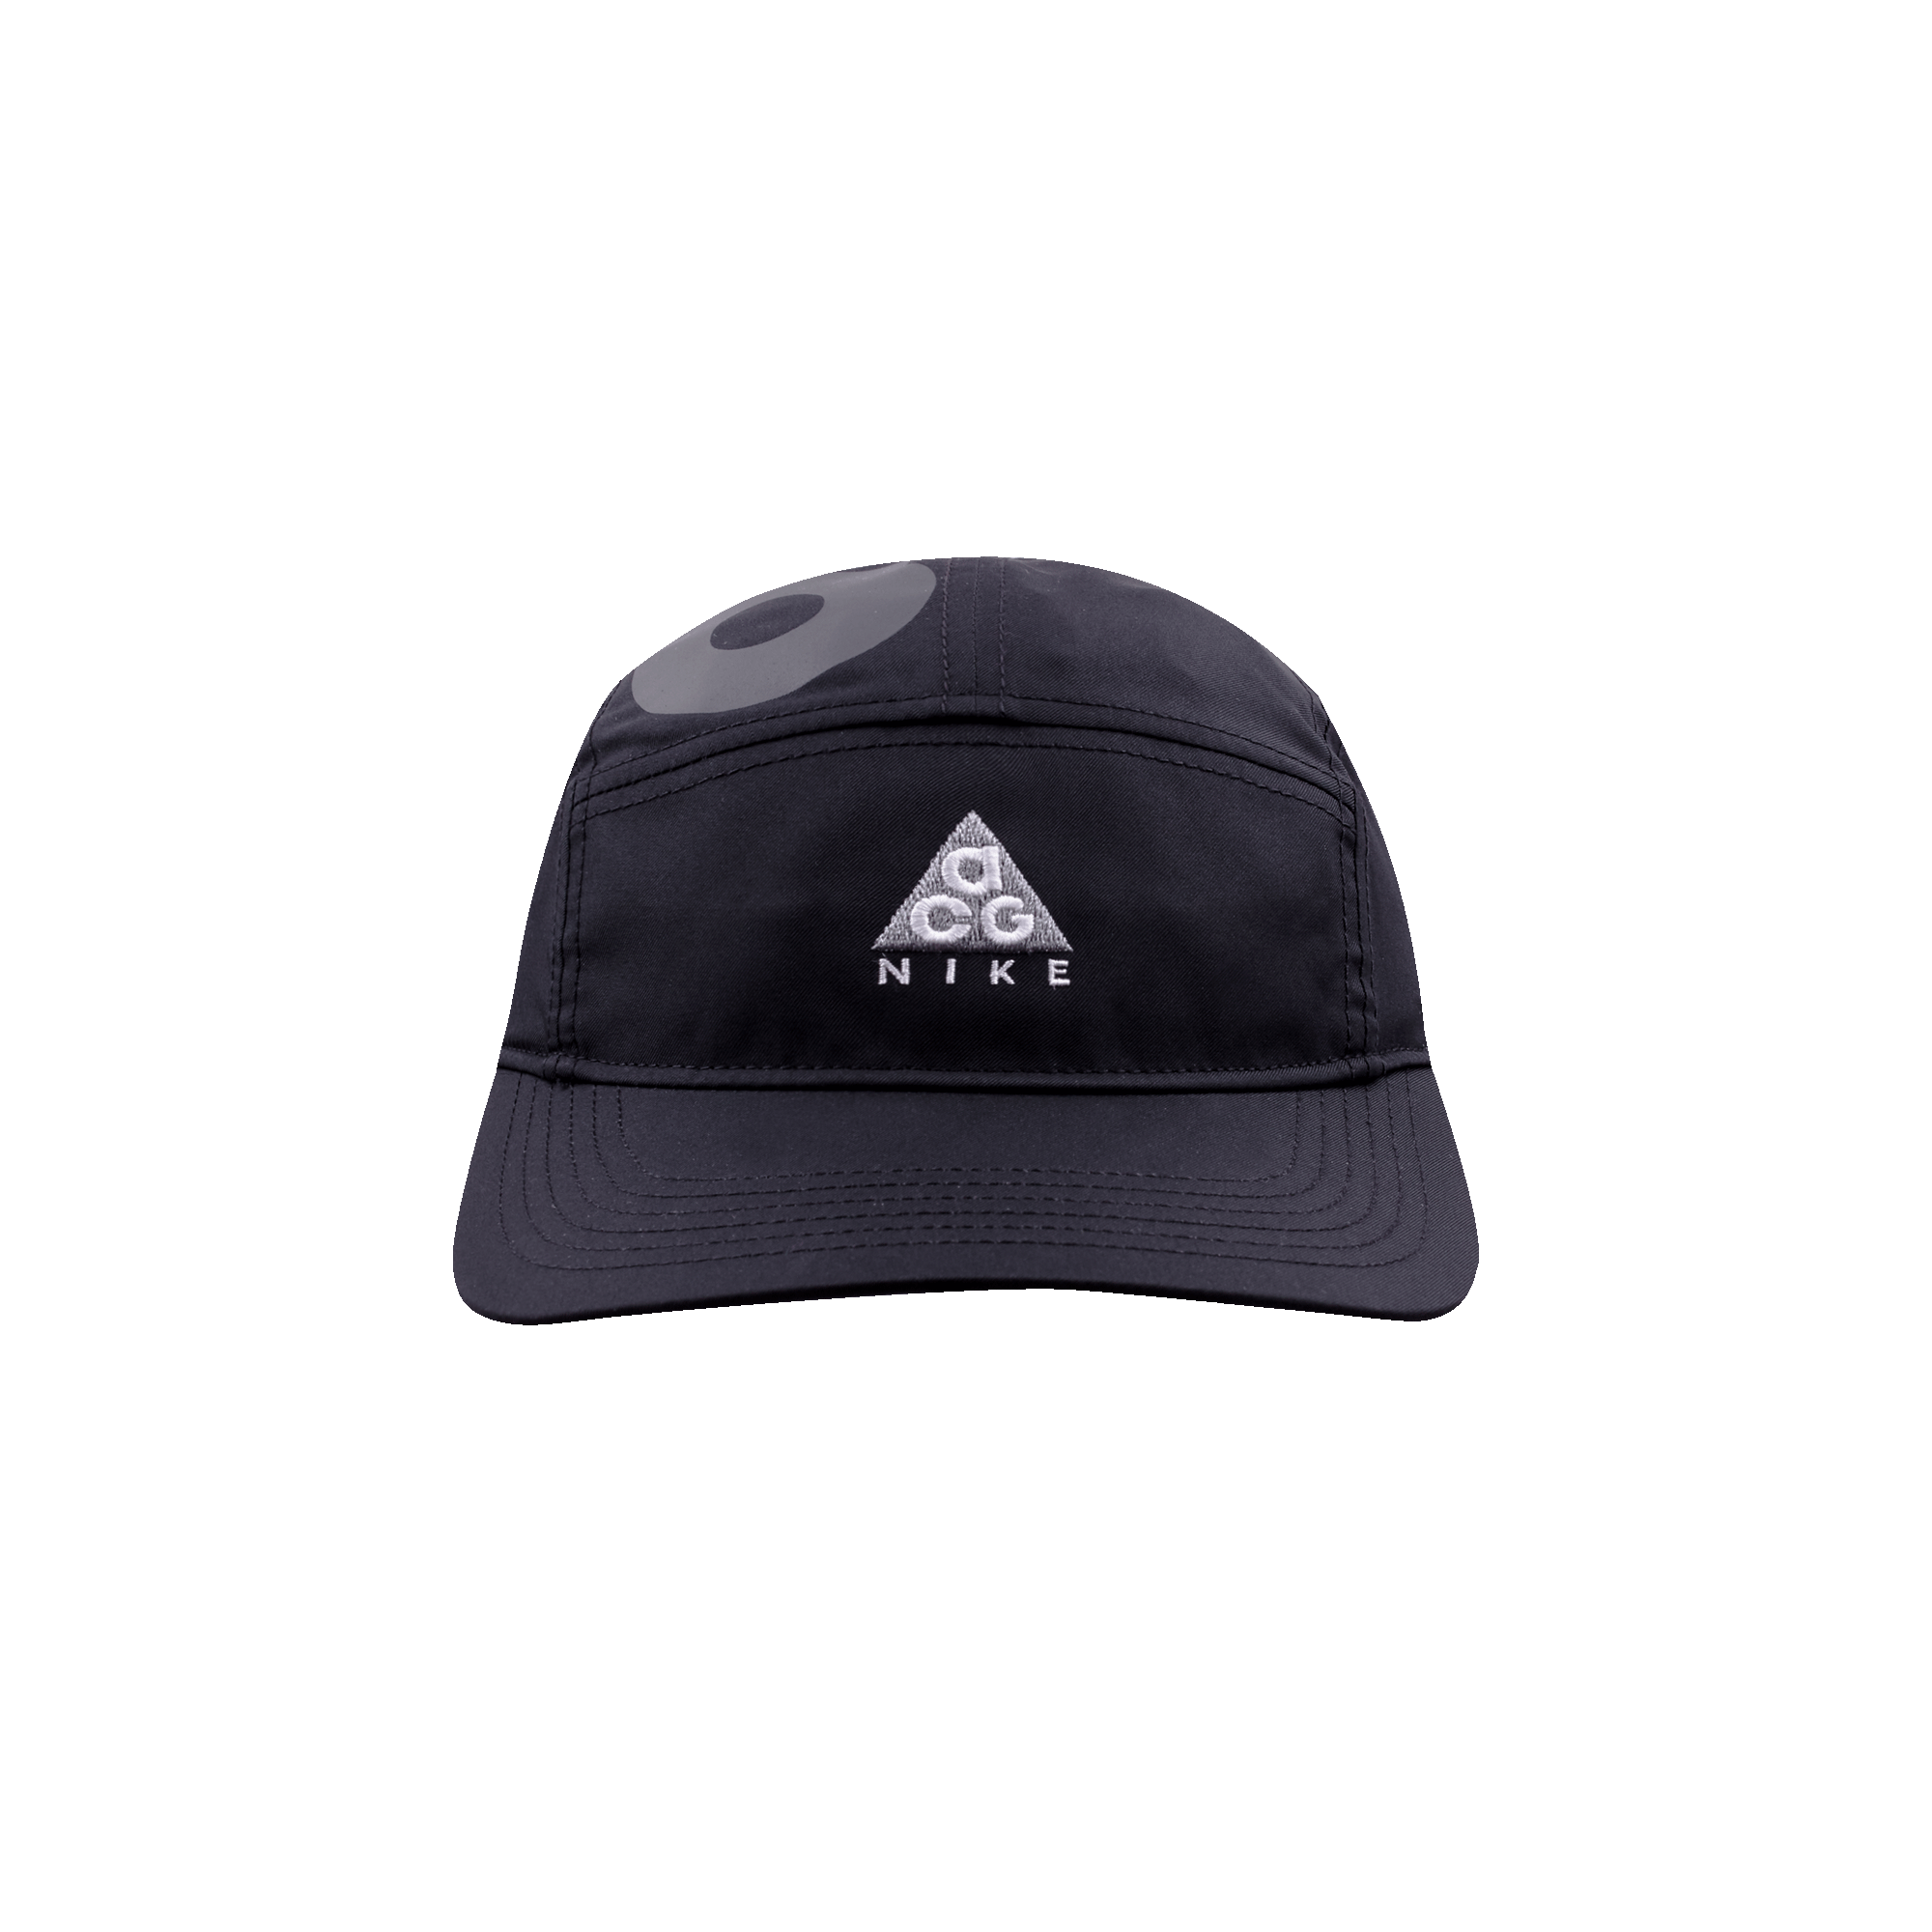 4ebb42ee Nike NSW Dry Aw84 Cap ACG black - Cappelli | Holypopstore.com